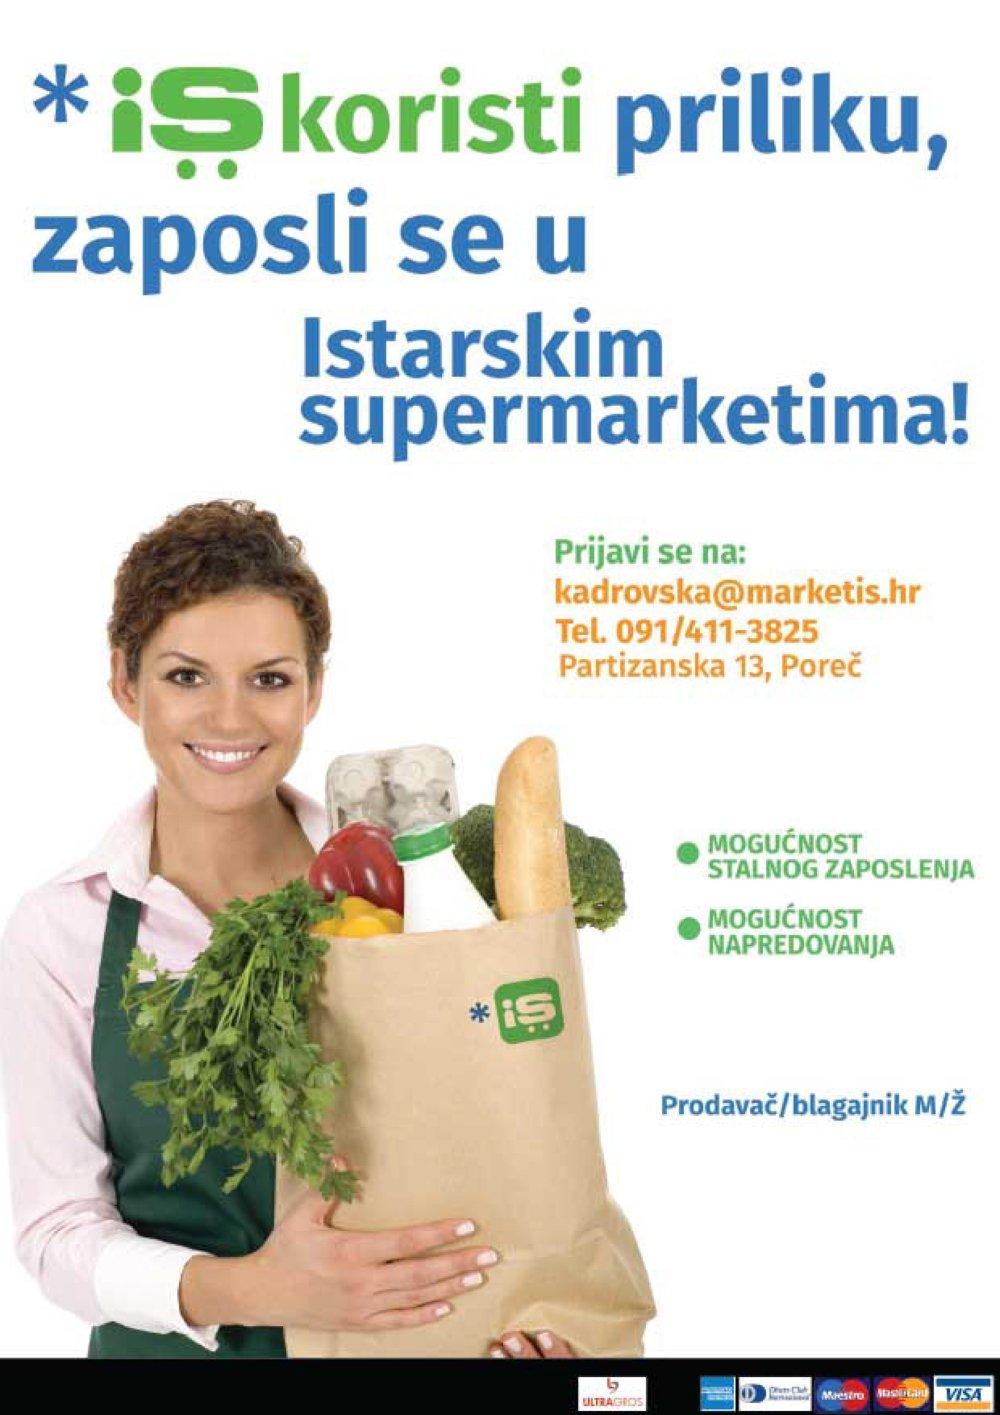 Istarski supermarketi katalog Akcija 08.01.-21.01.2018.